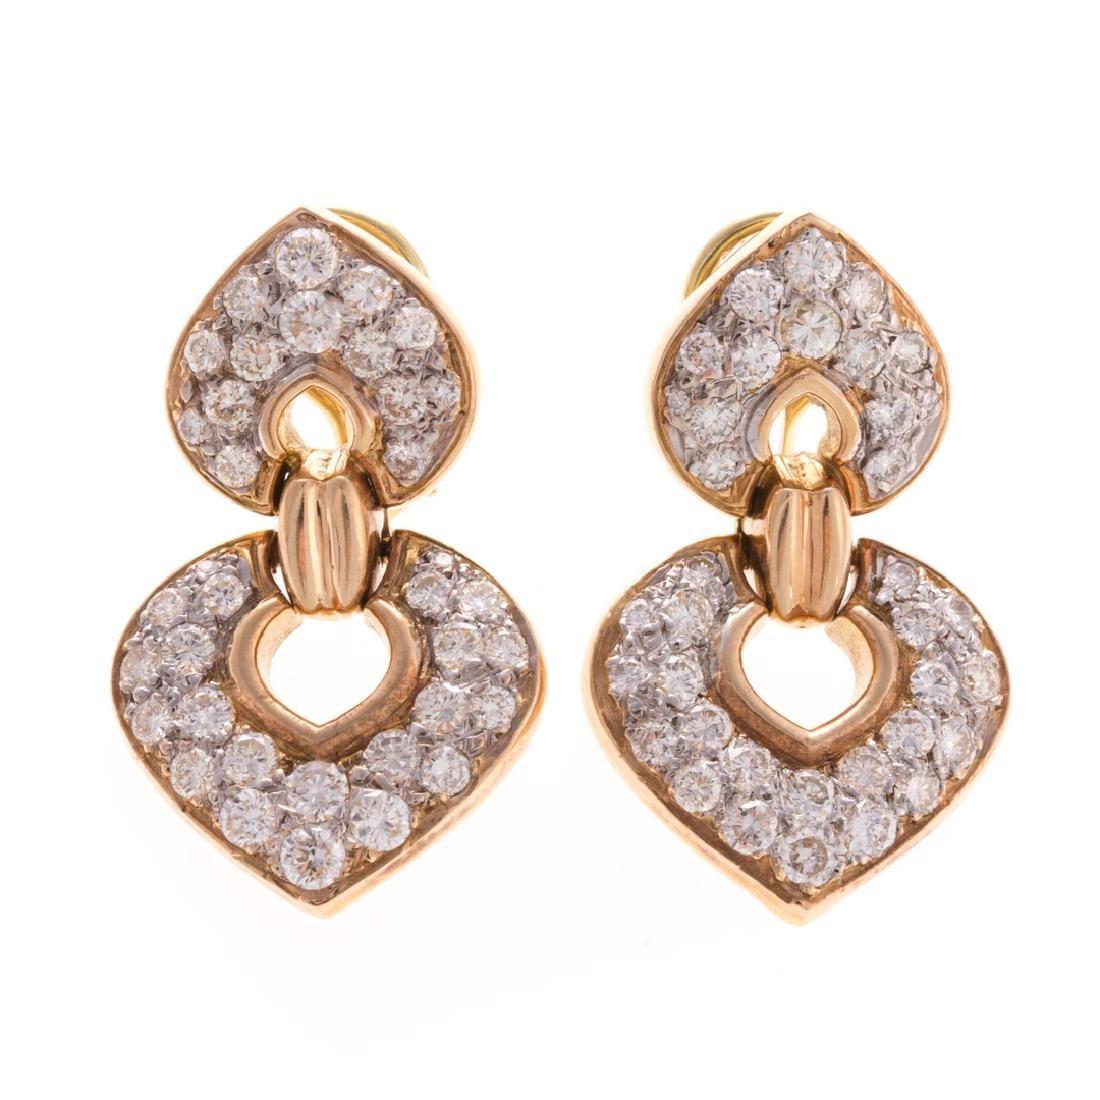 A Lady's 14K Diamond Ear Pendants